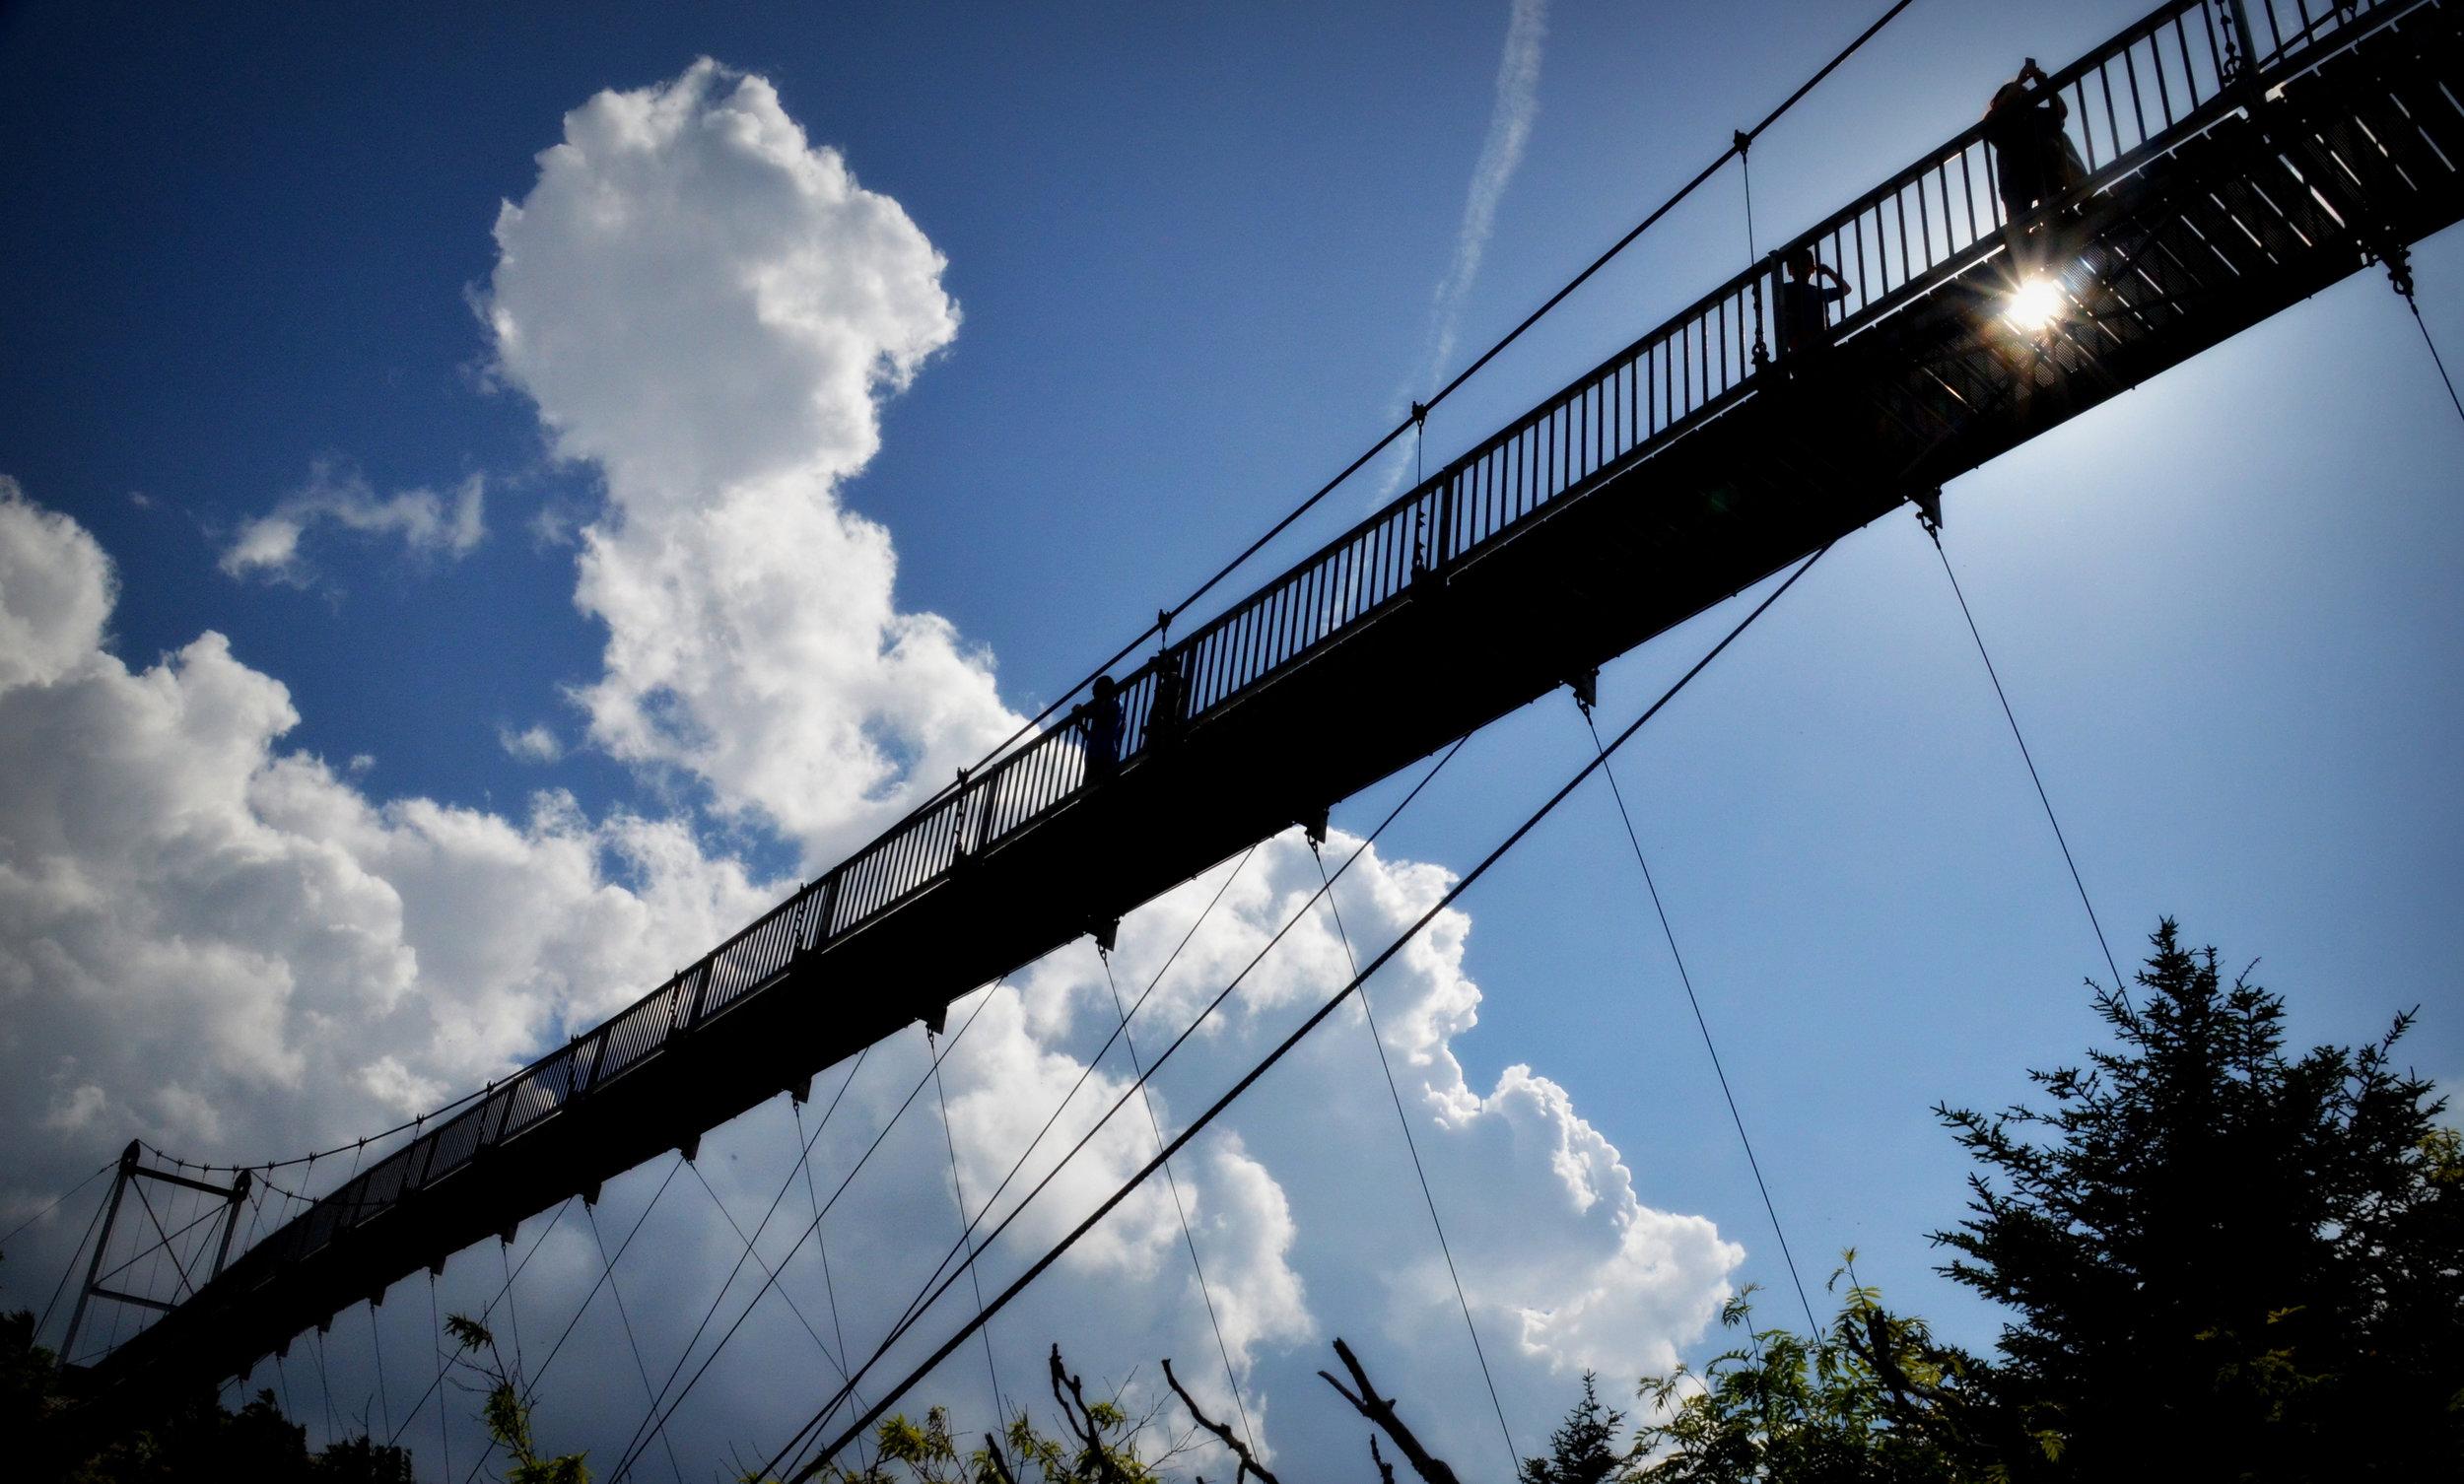 Bridge No Border - V. Darlington.jpg